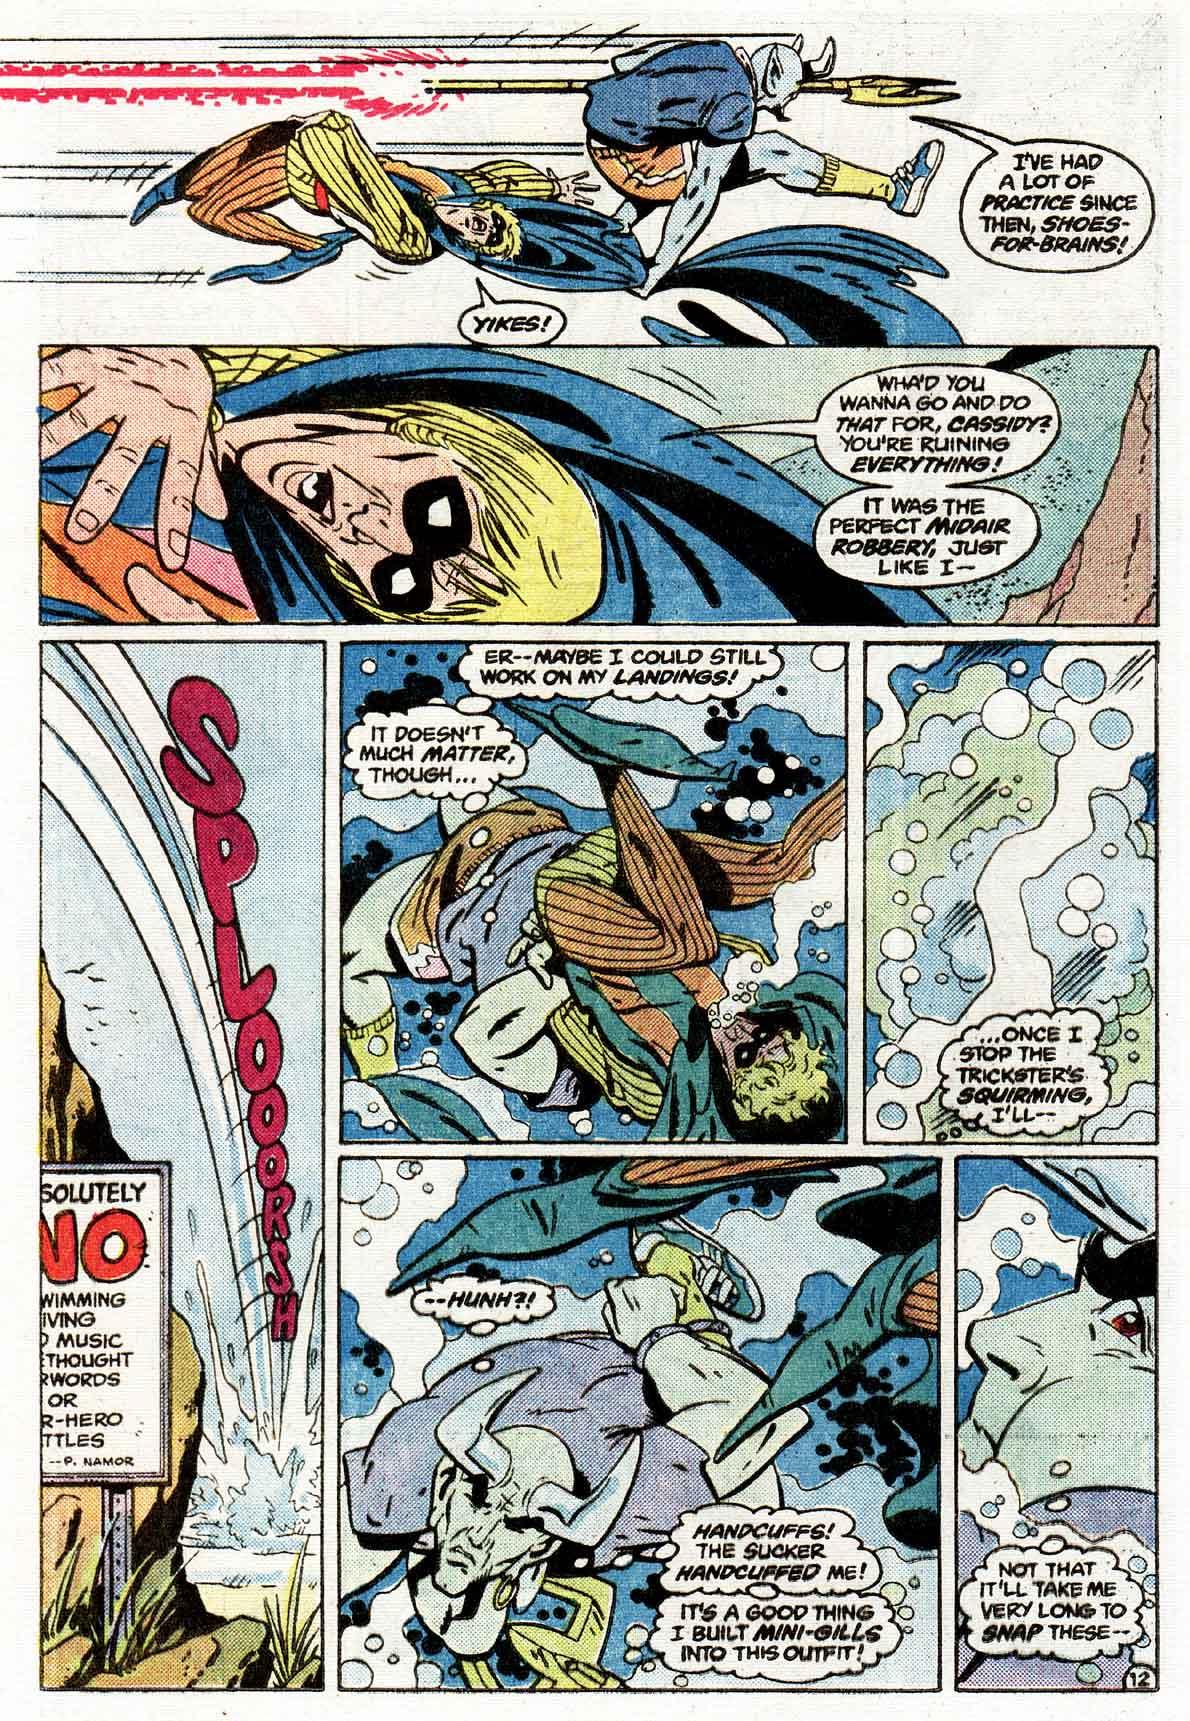 Best of DC Blue Ribbon Digest #71: Year's Best Comics Stories